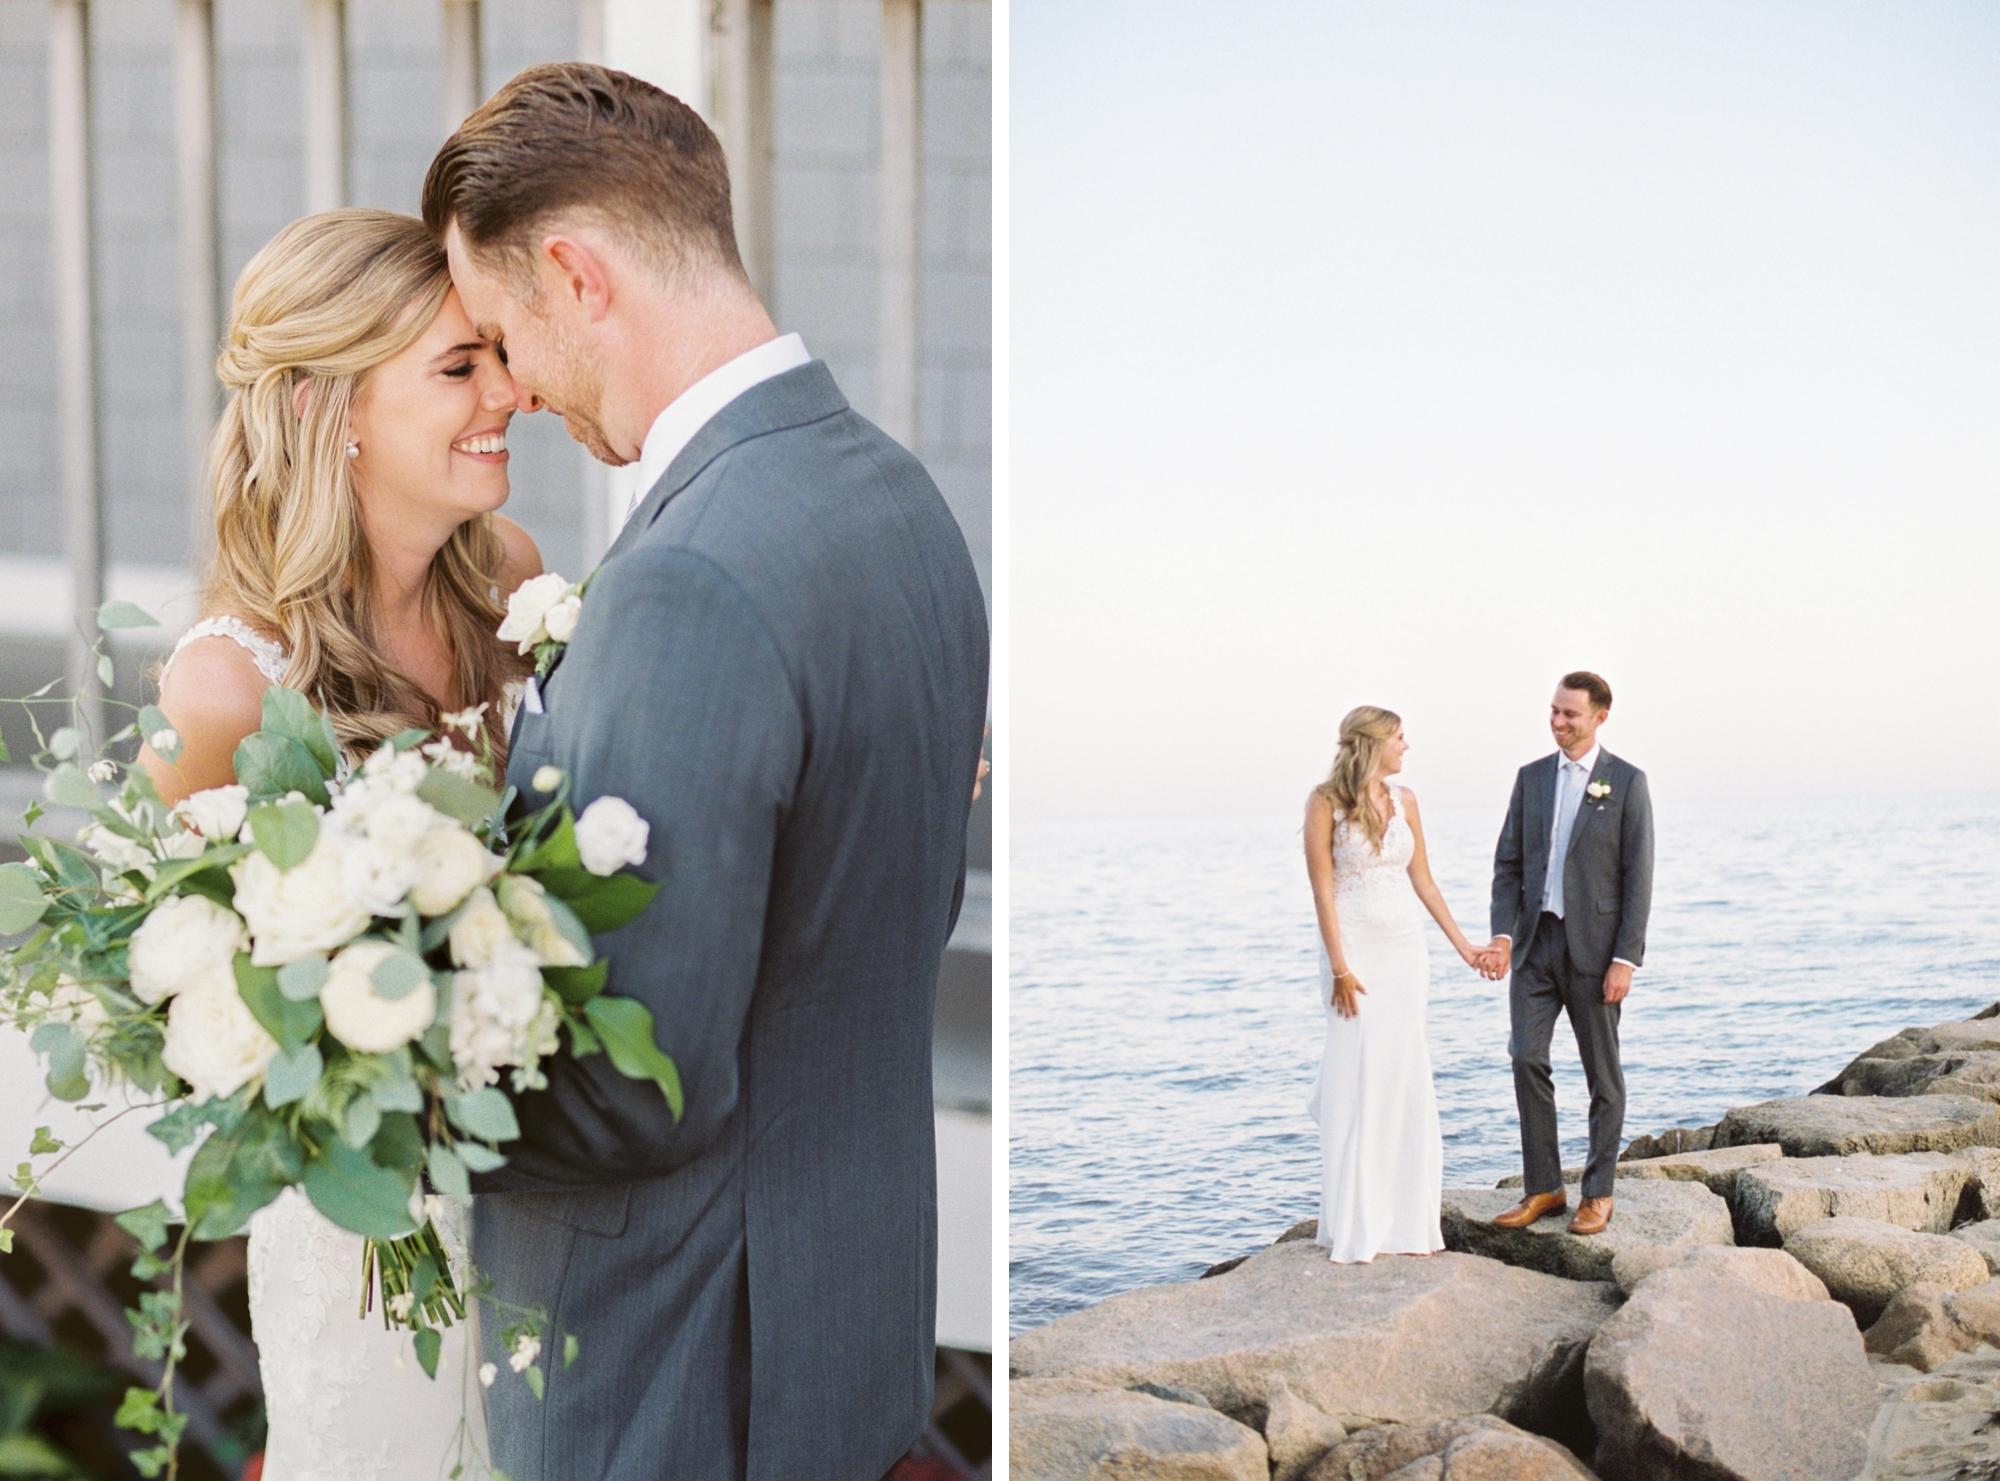 Cape Cod Weddings